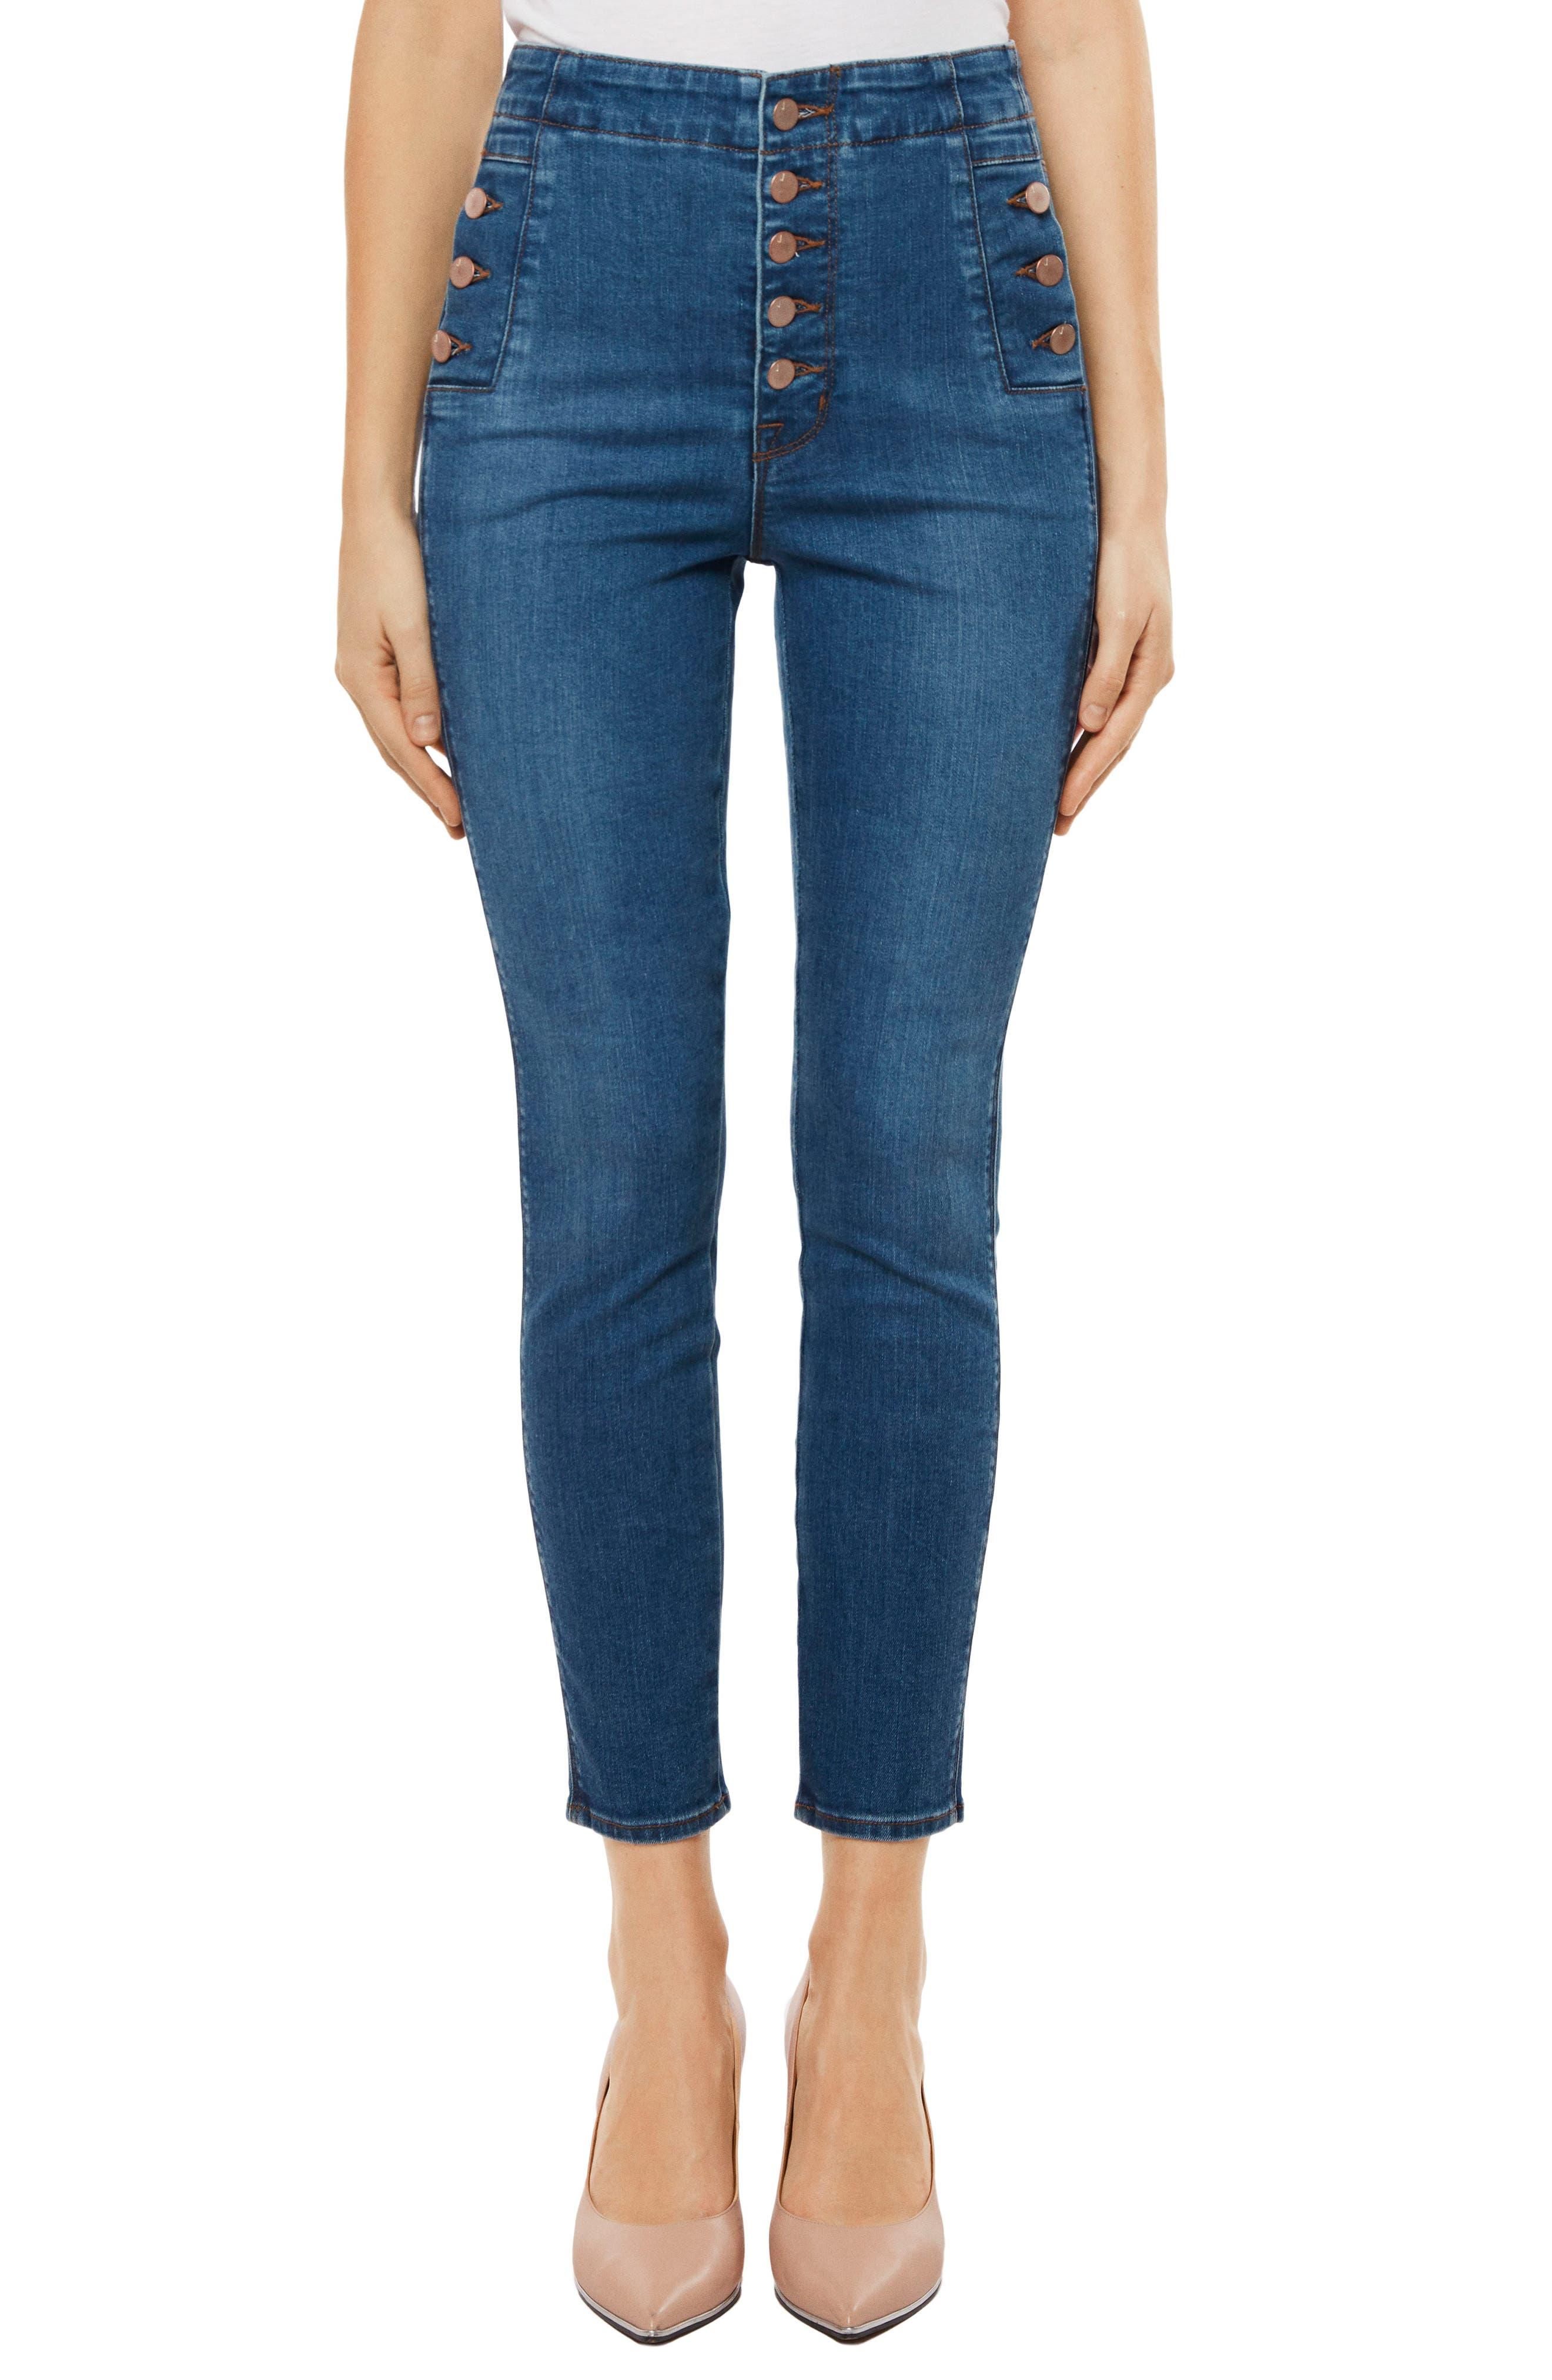 Natasha Sky High High Waist Crop Skinny Jeans,                             Main thumbnail 1, color,                             LOVESICK